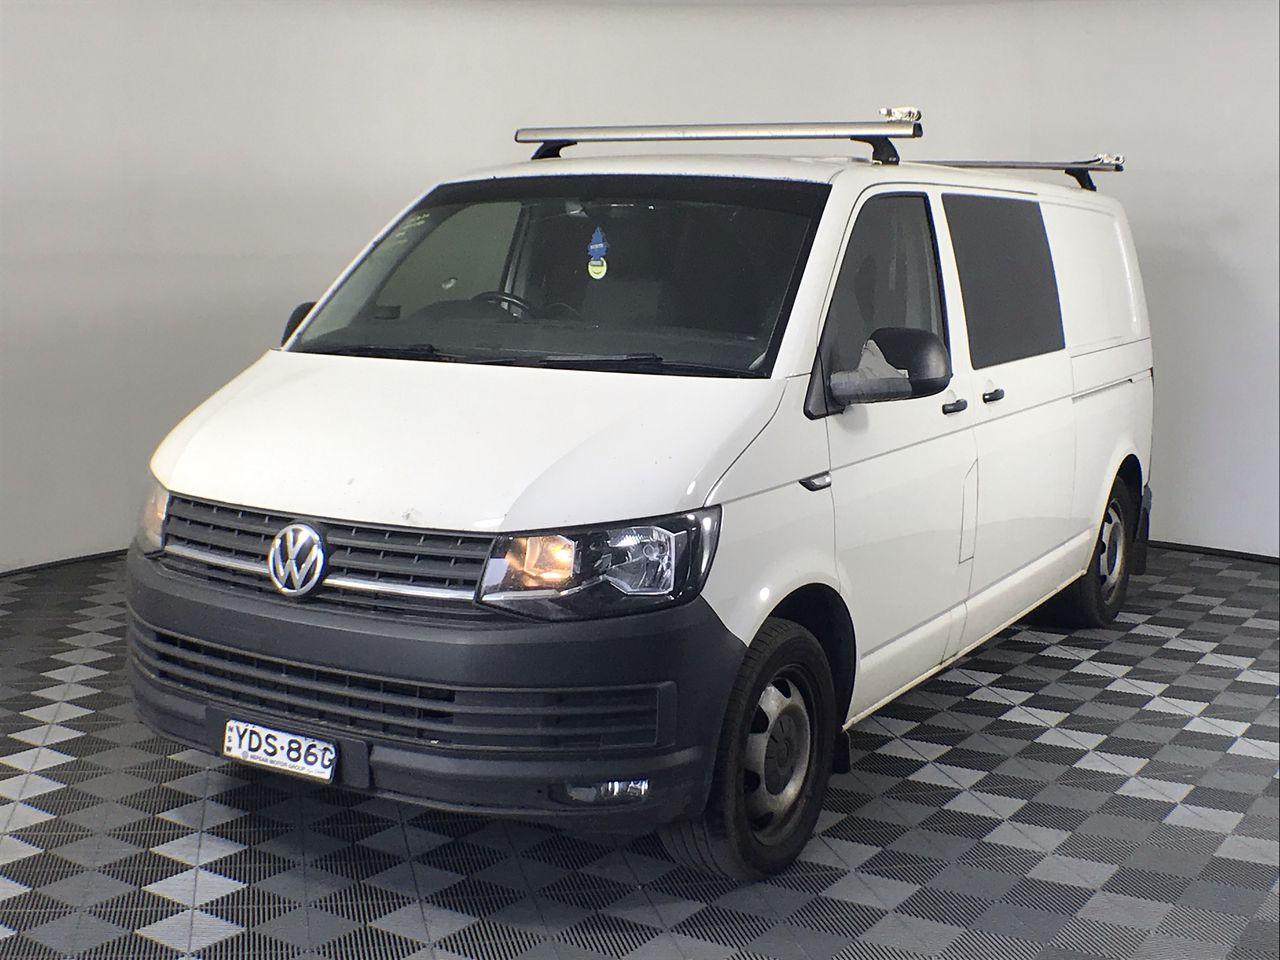 2016 Volkswagen Transporter TDI400 LWB T6 Turbo Diesel Automatic Van